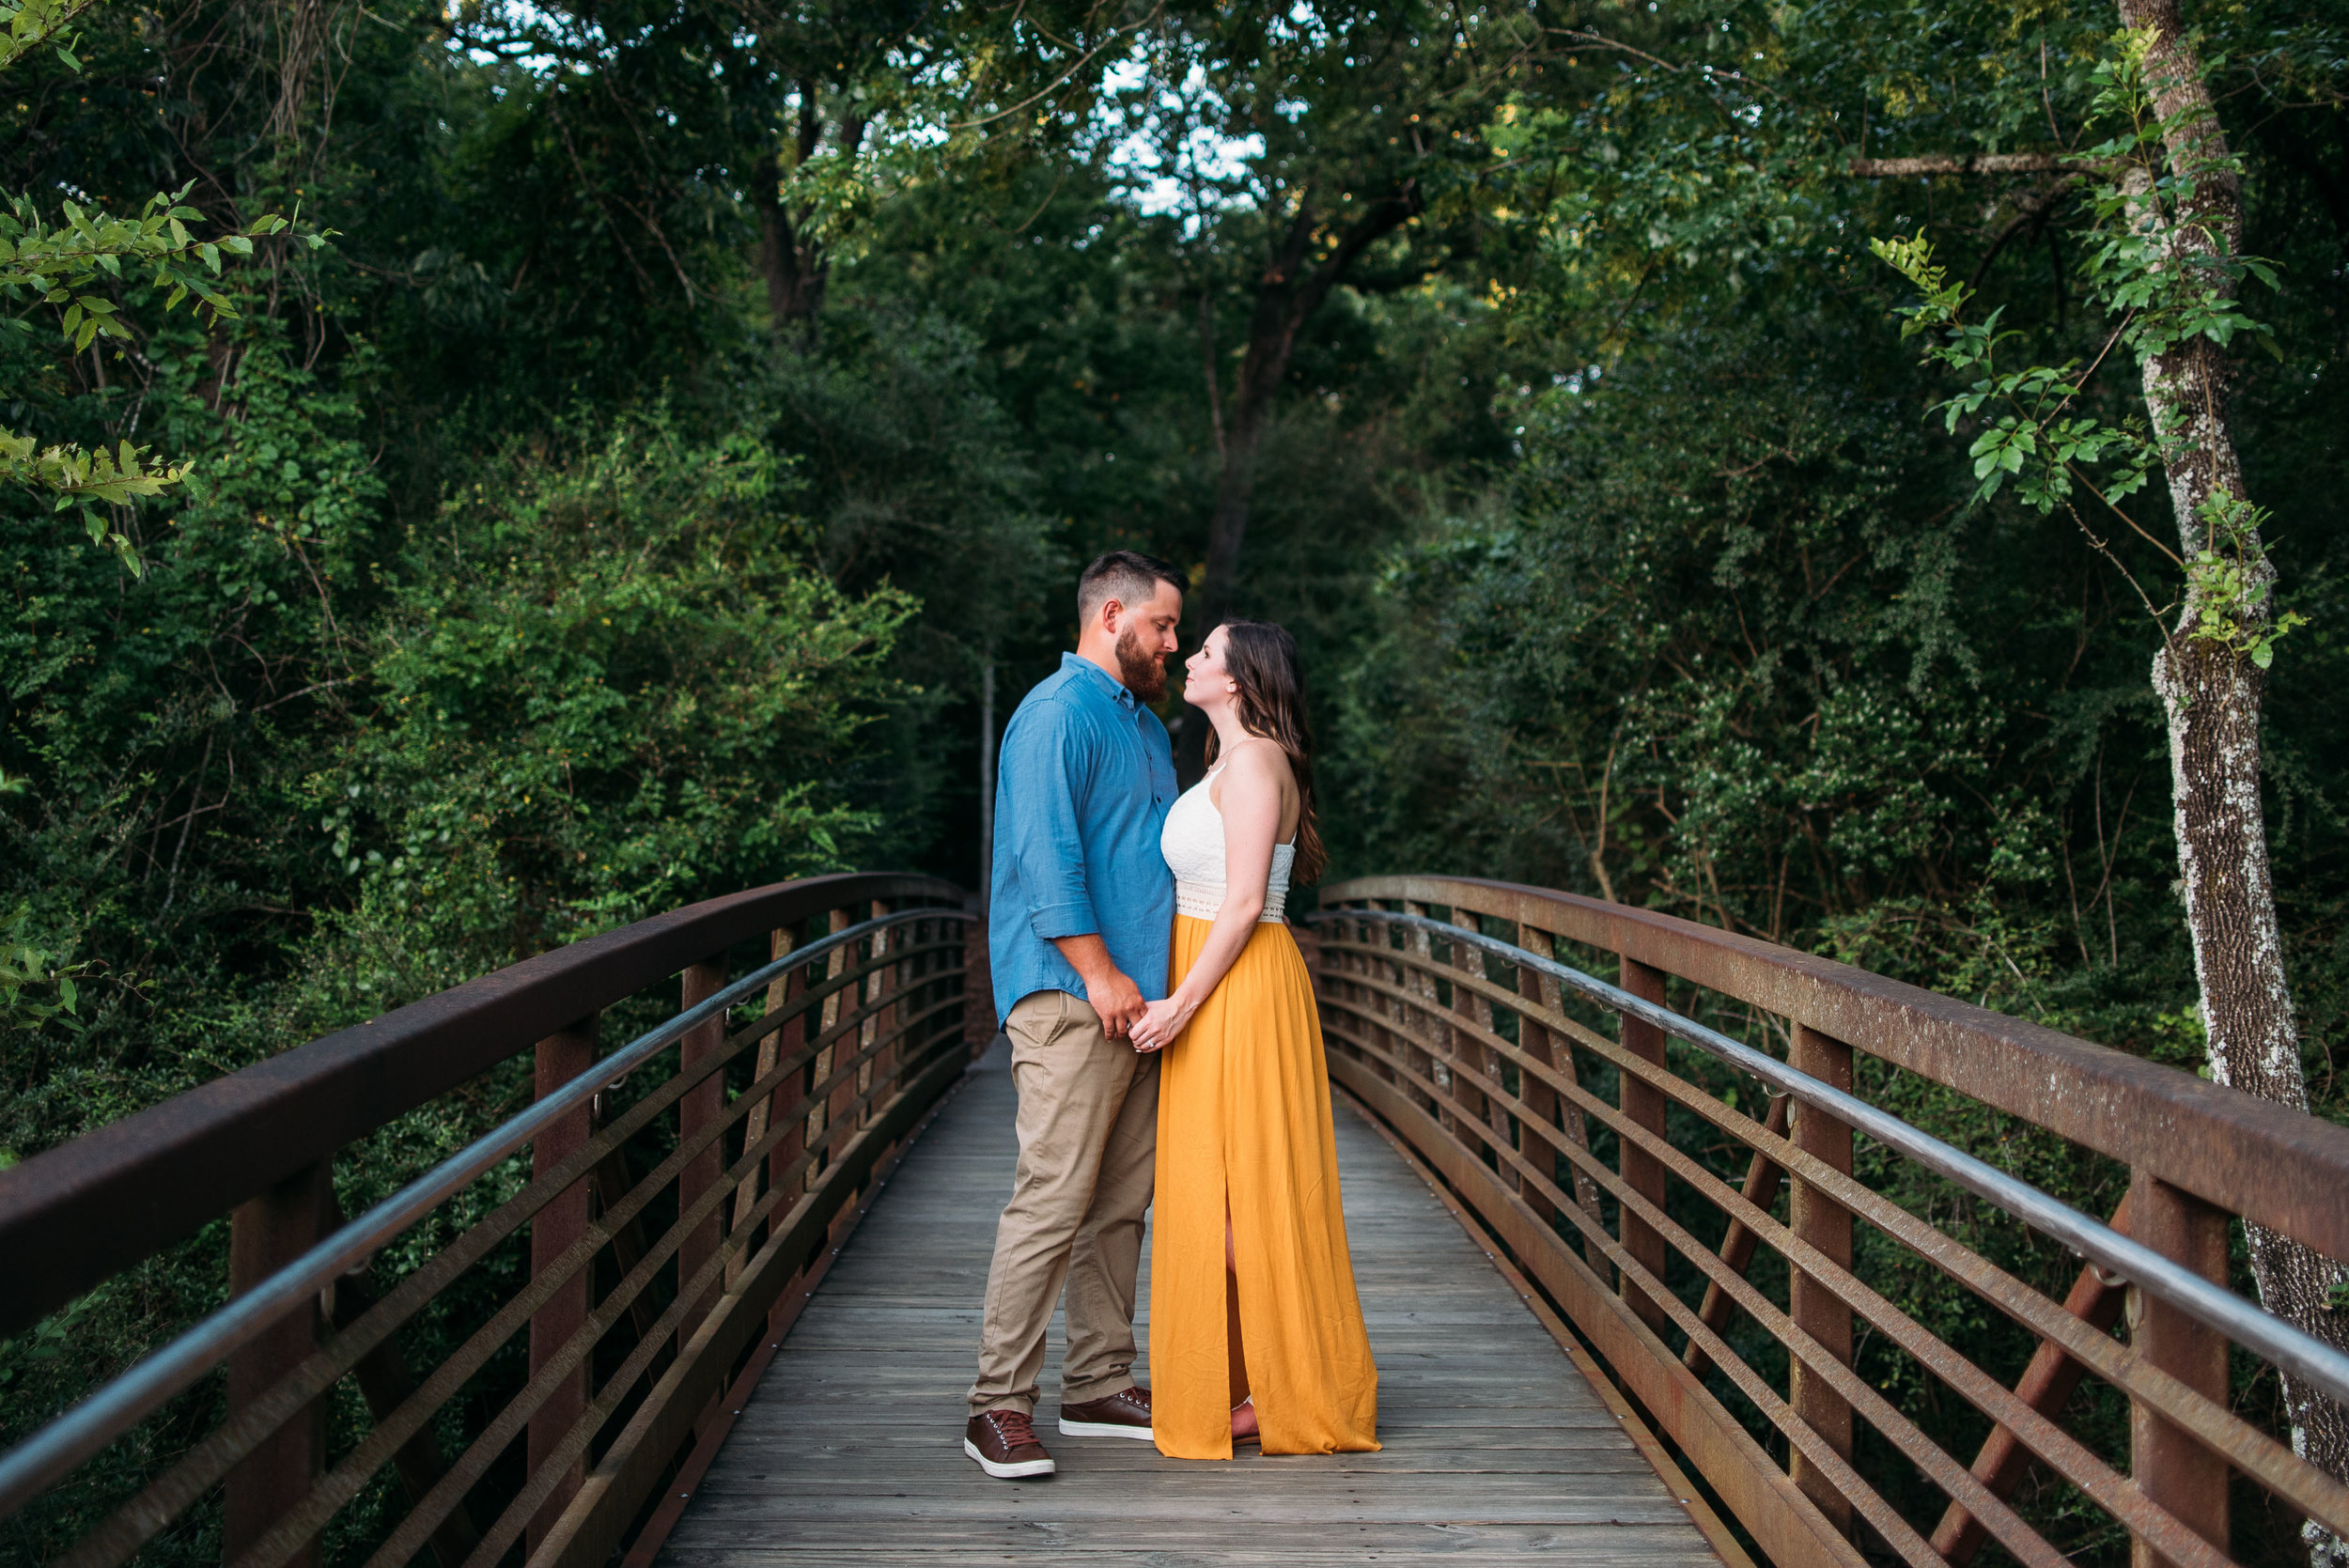 George-Bush-Library-Texas-A&M-University-Engagement-College-Station-Wedding-Photographer-San-Angel-Photo-Mark-Jenna-Matt-Century-Tree-20.jpg